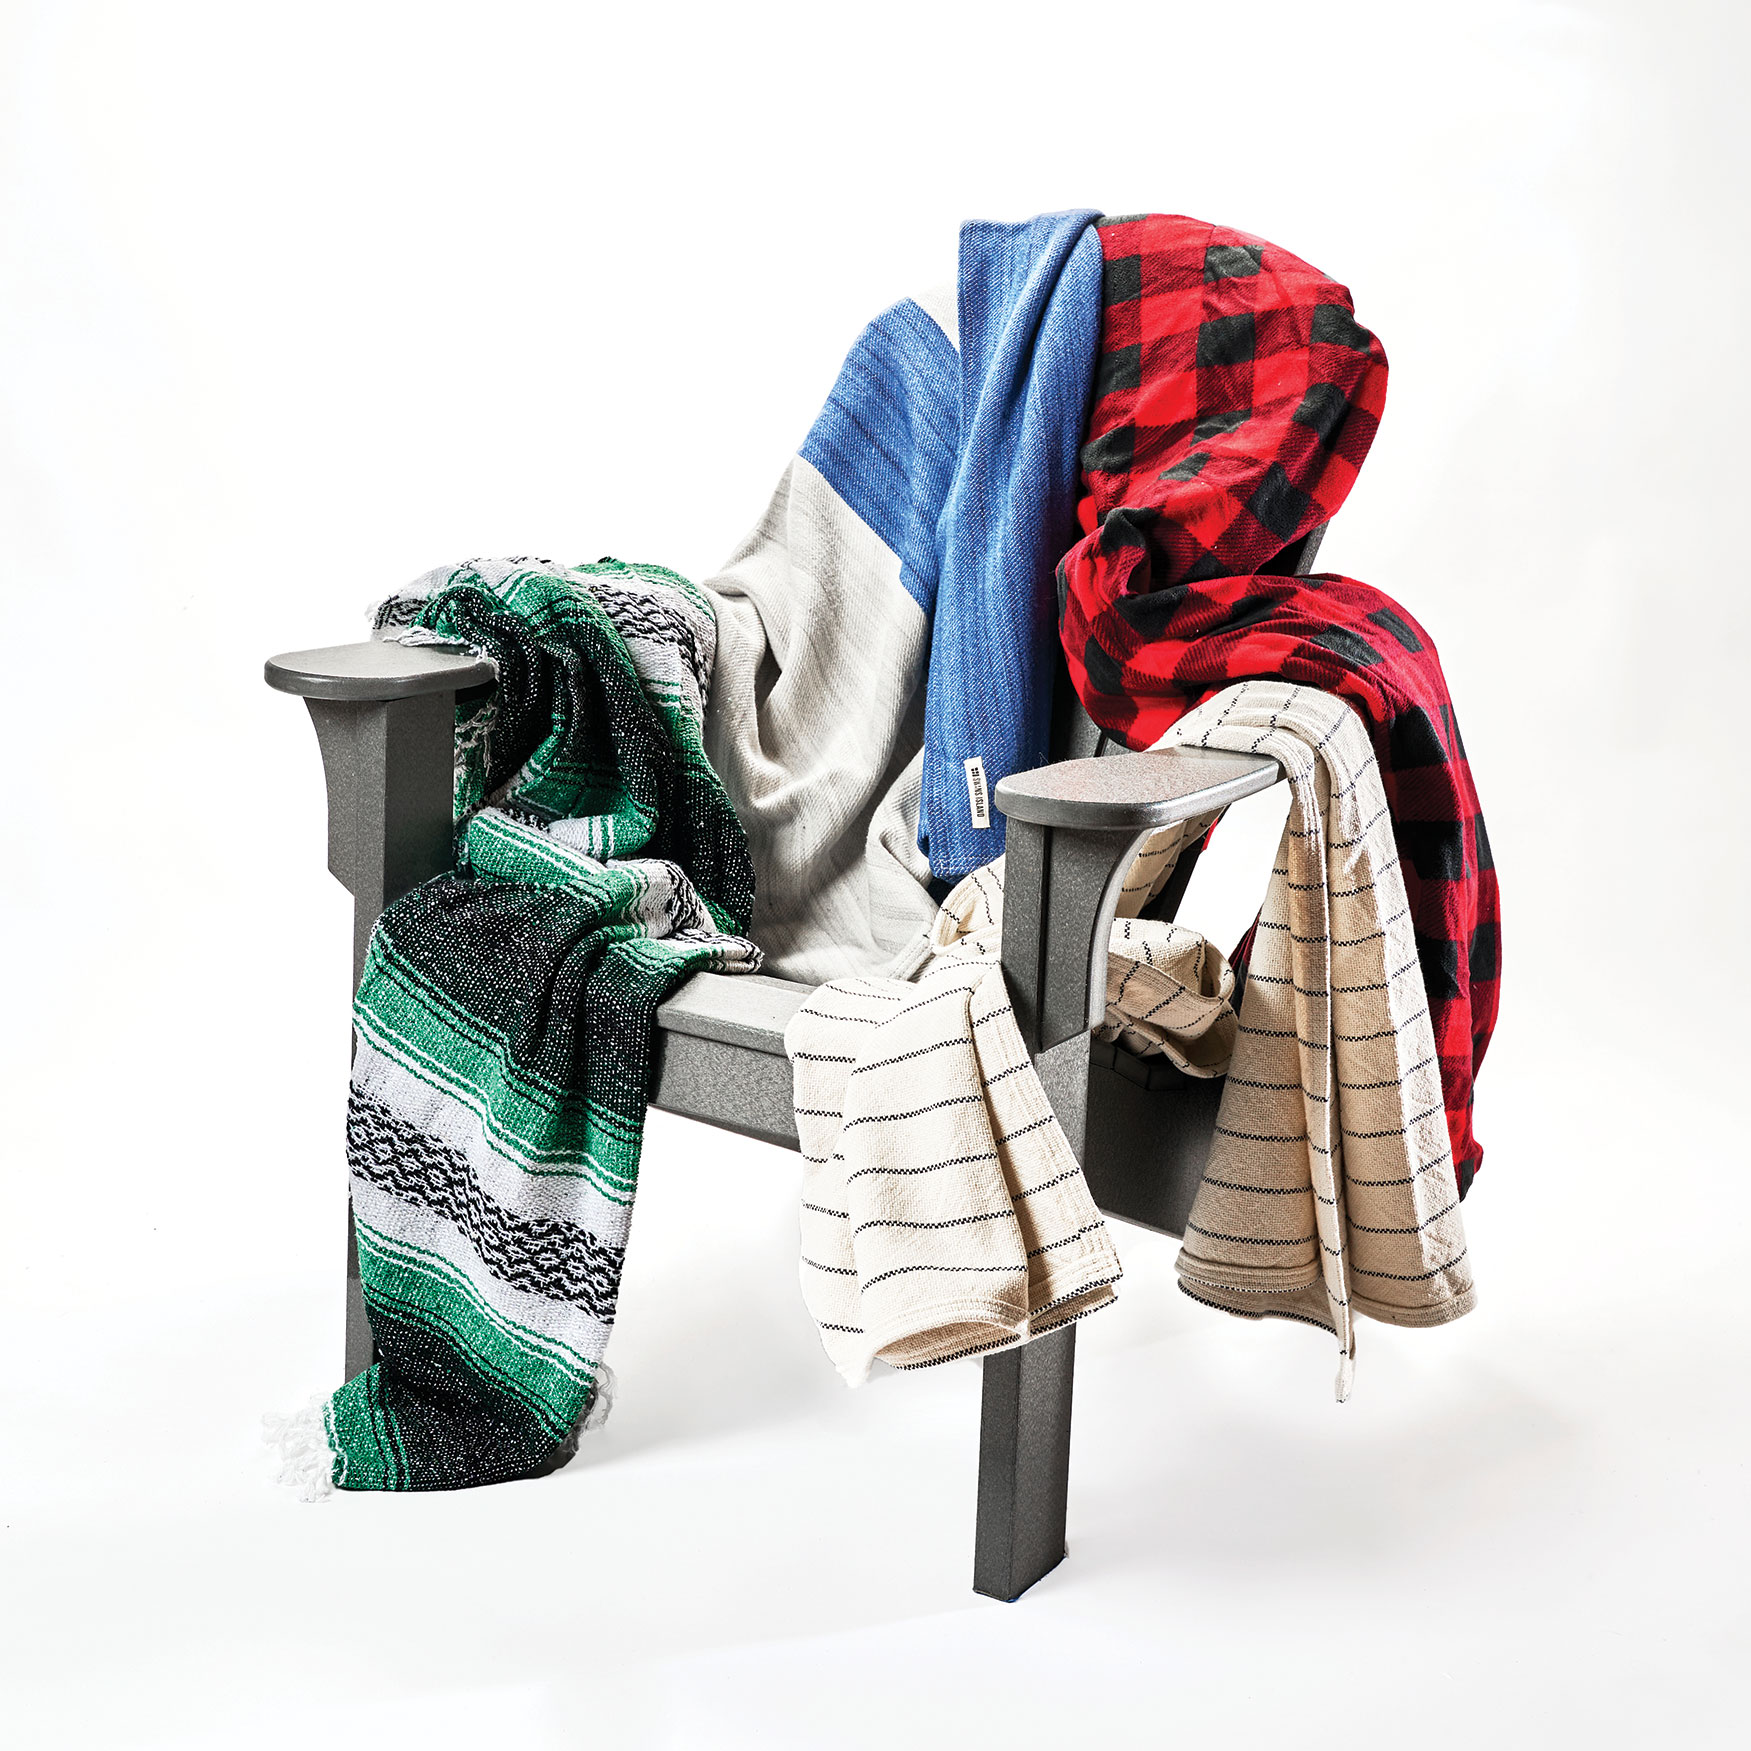 Maine throw blankets